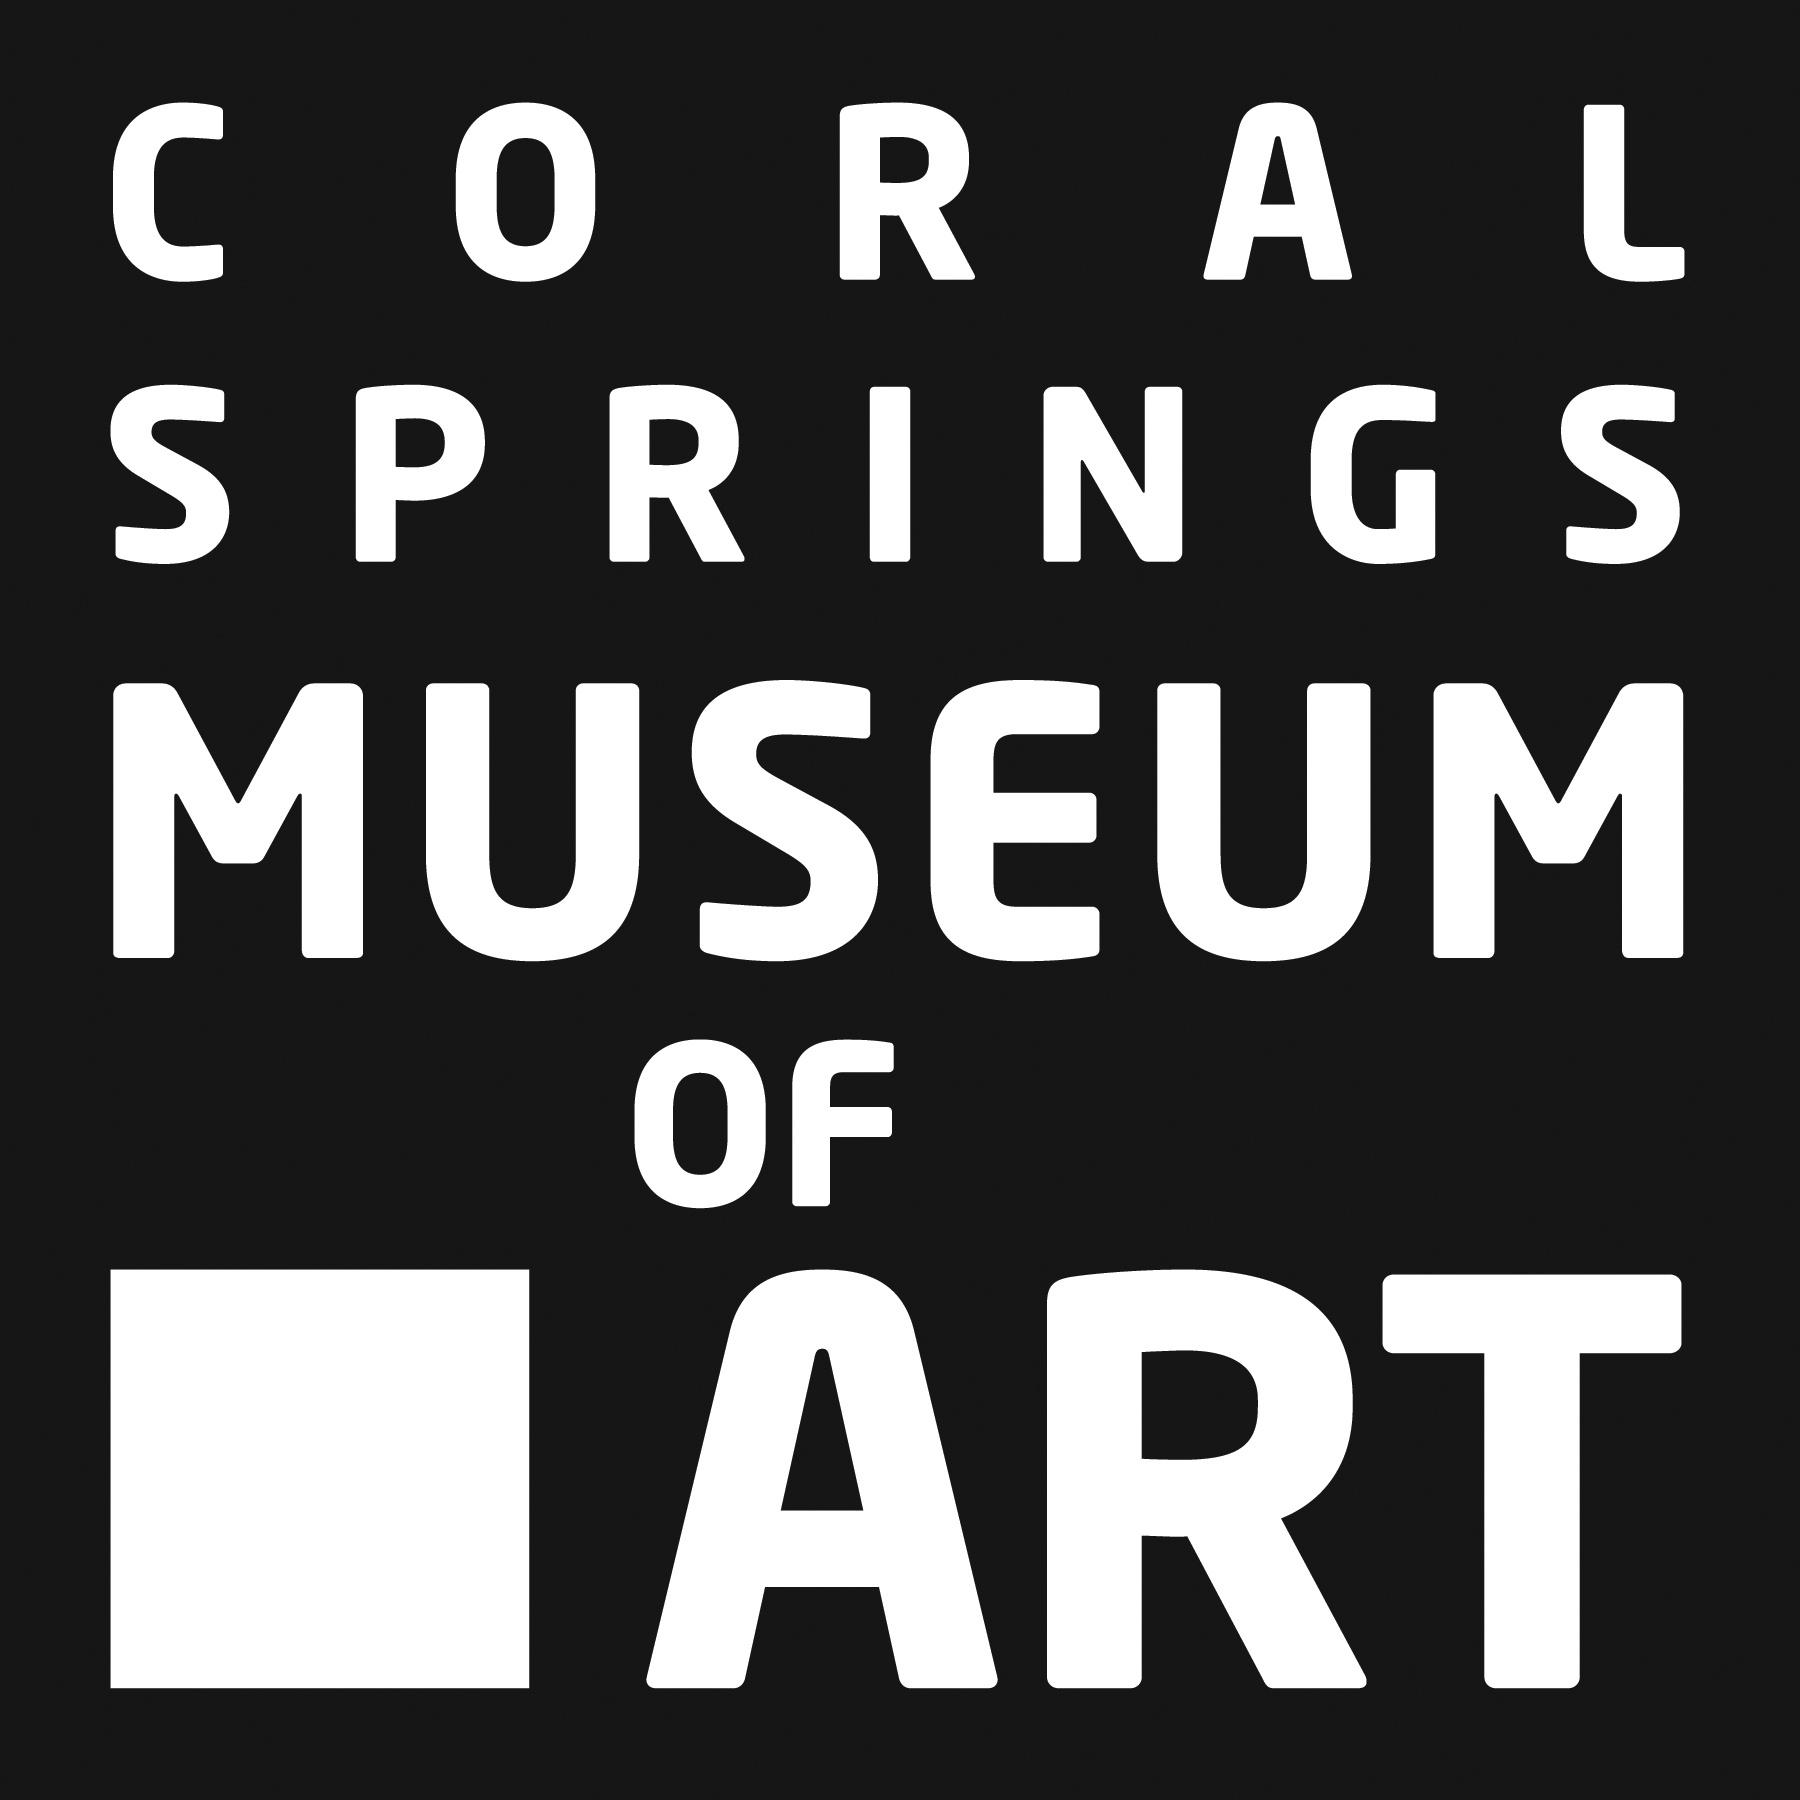 Coral Springs Museum of Art